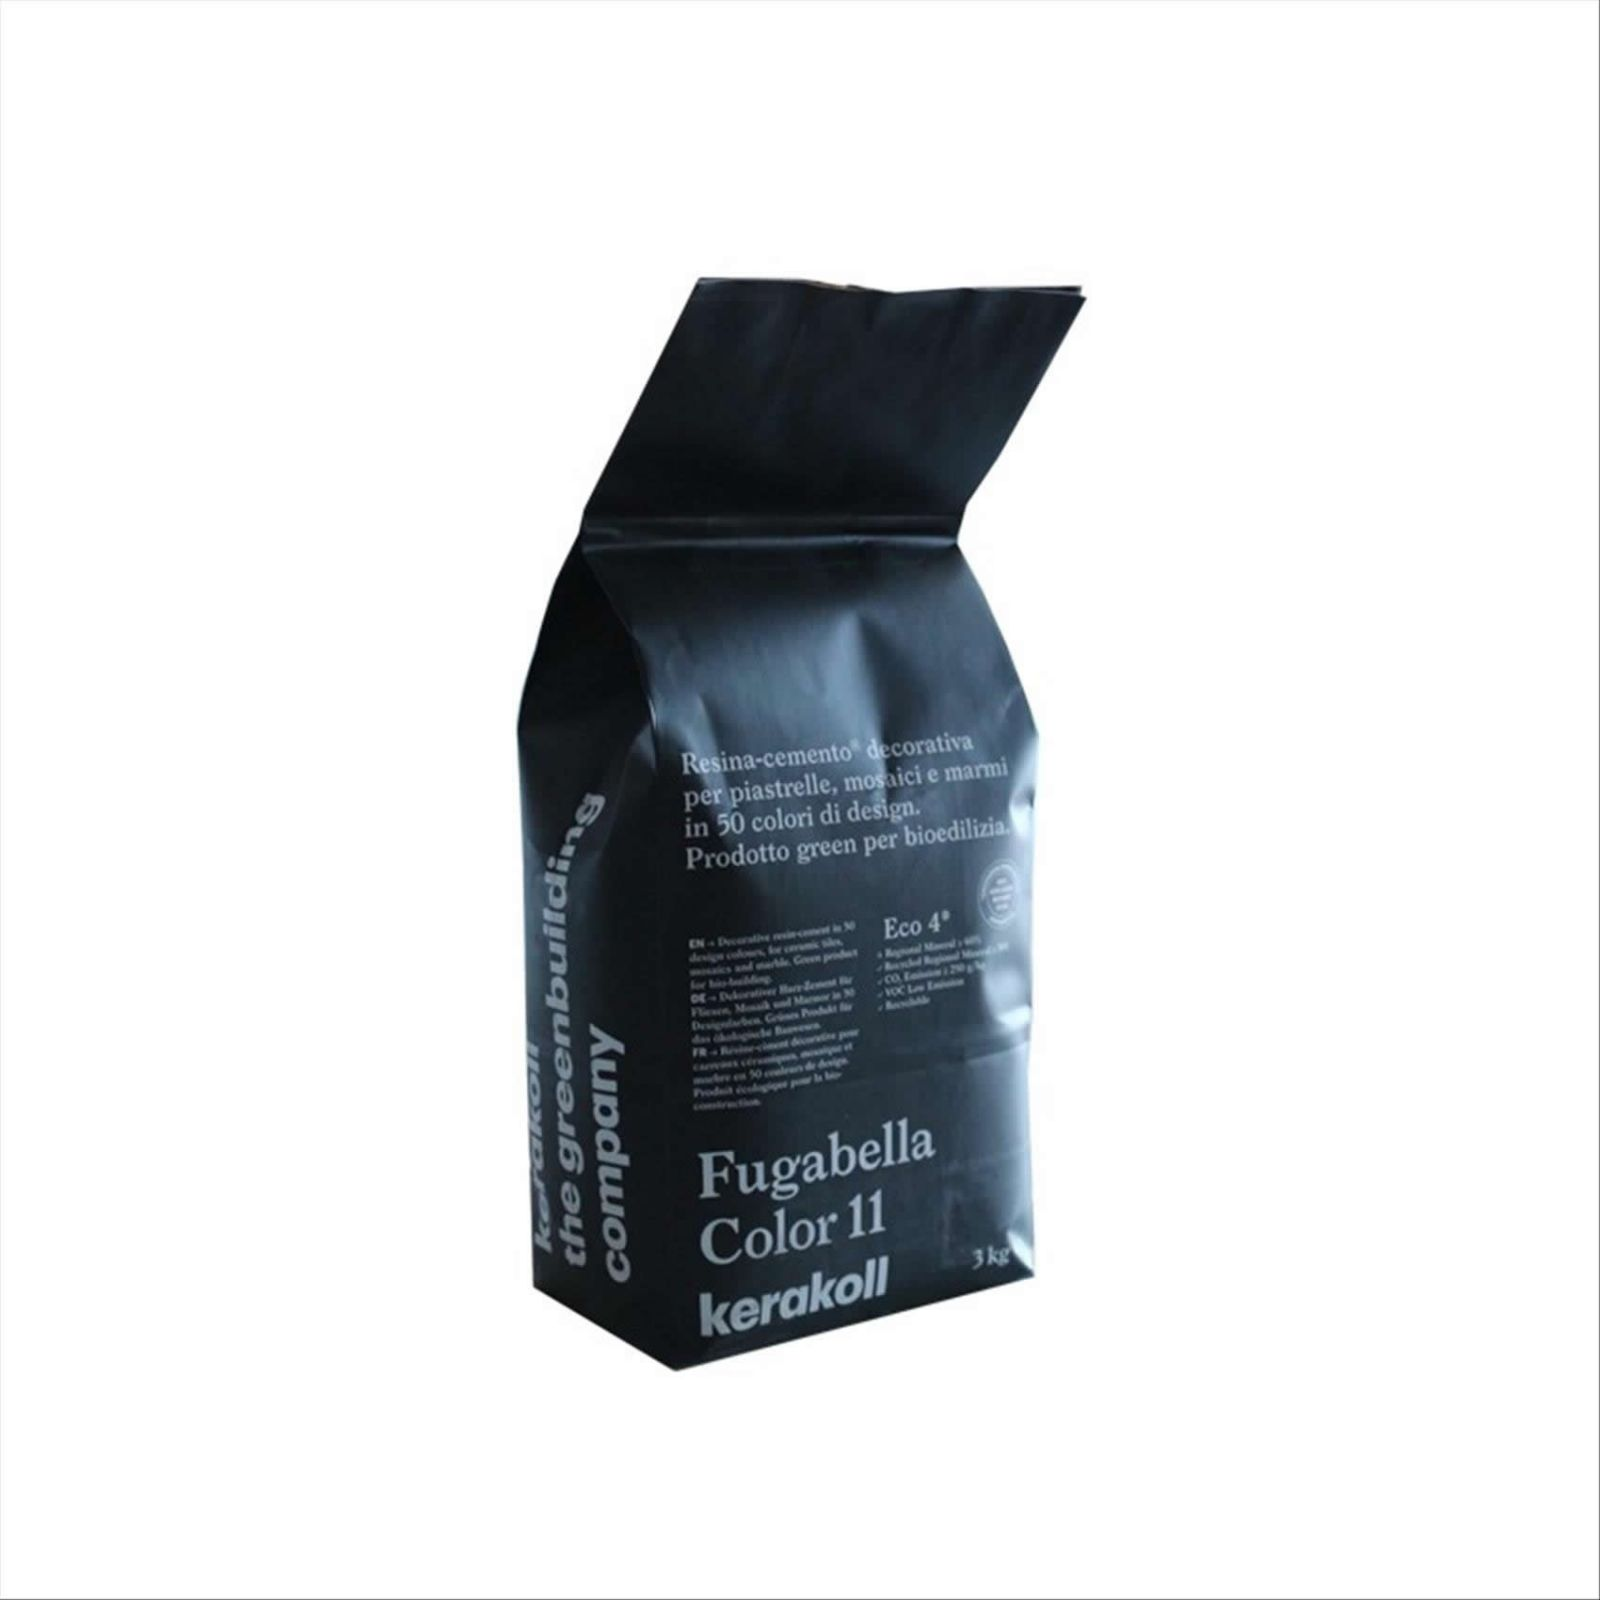 Fugabella Color 11 3kg